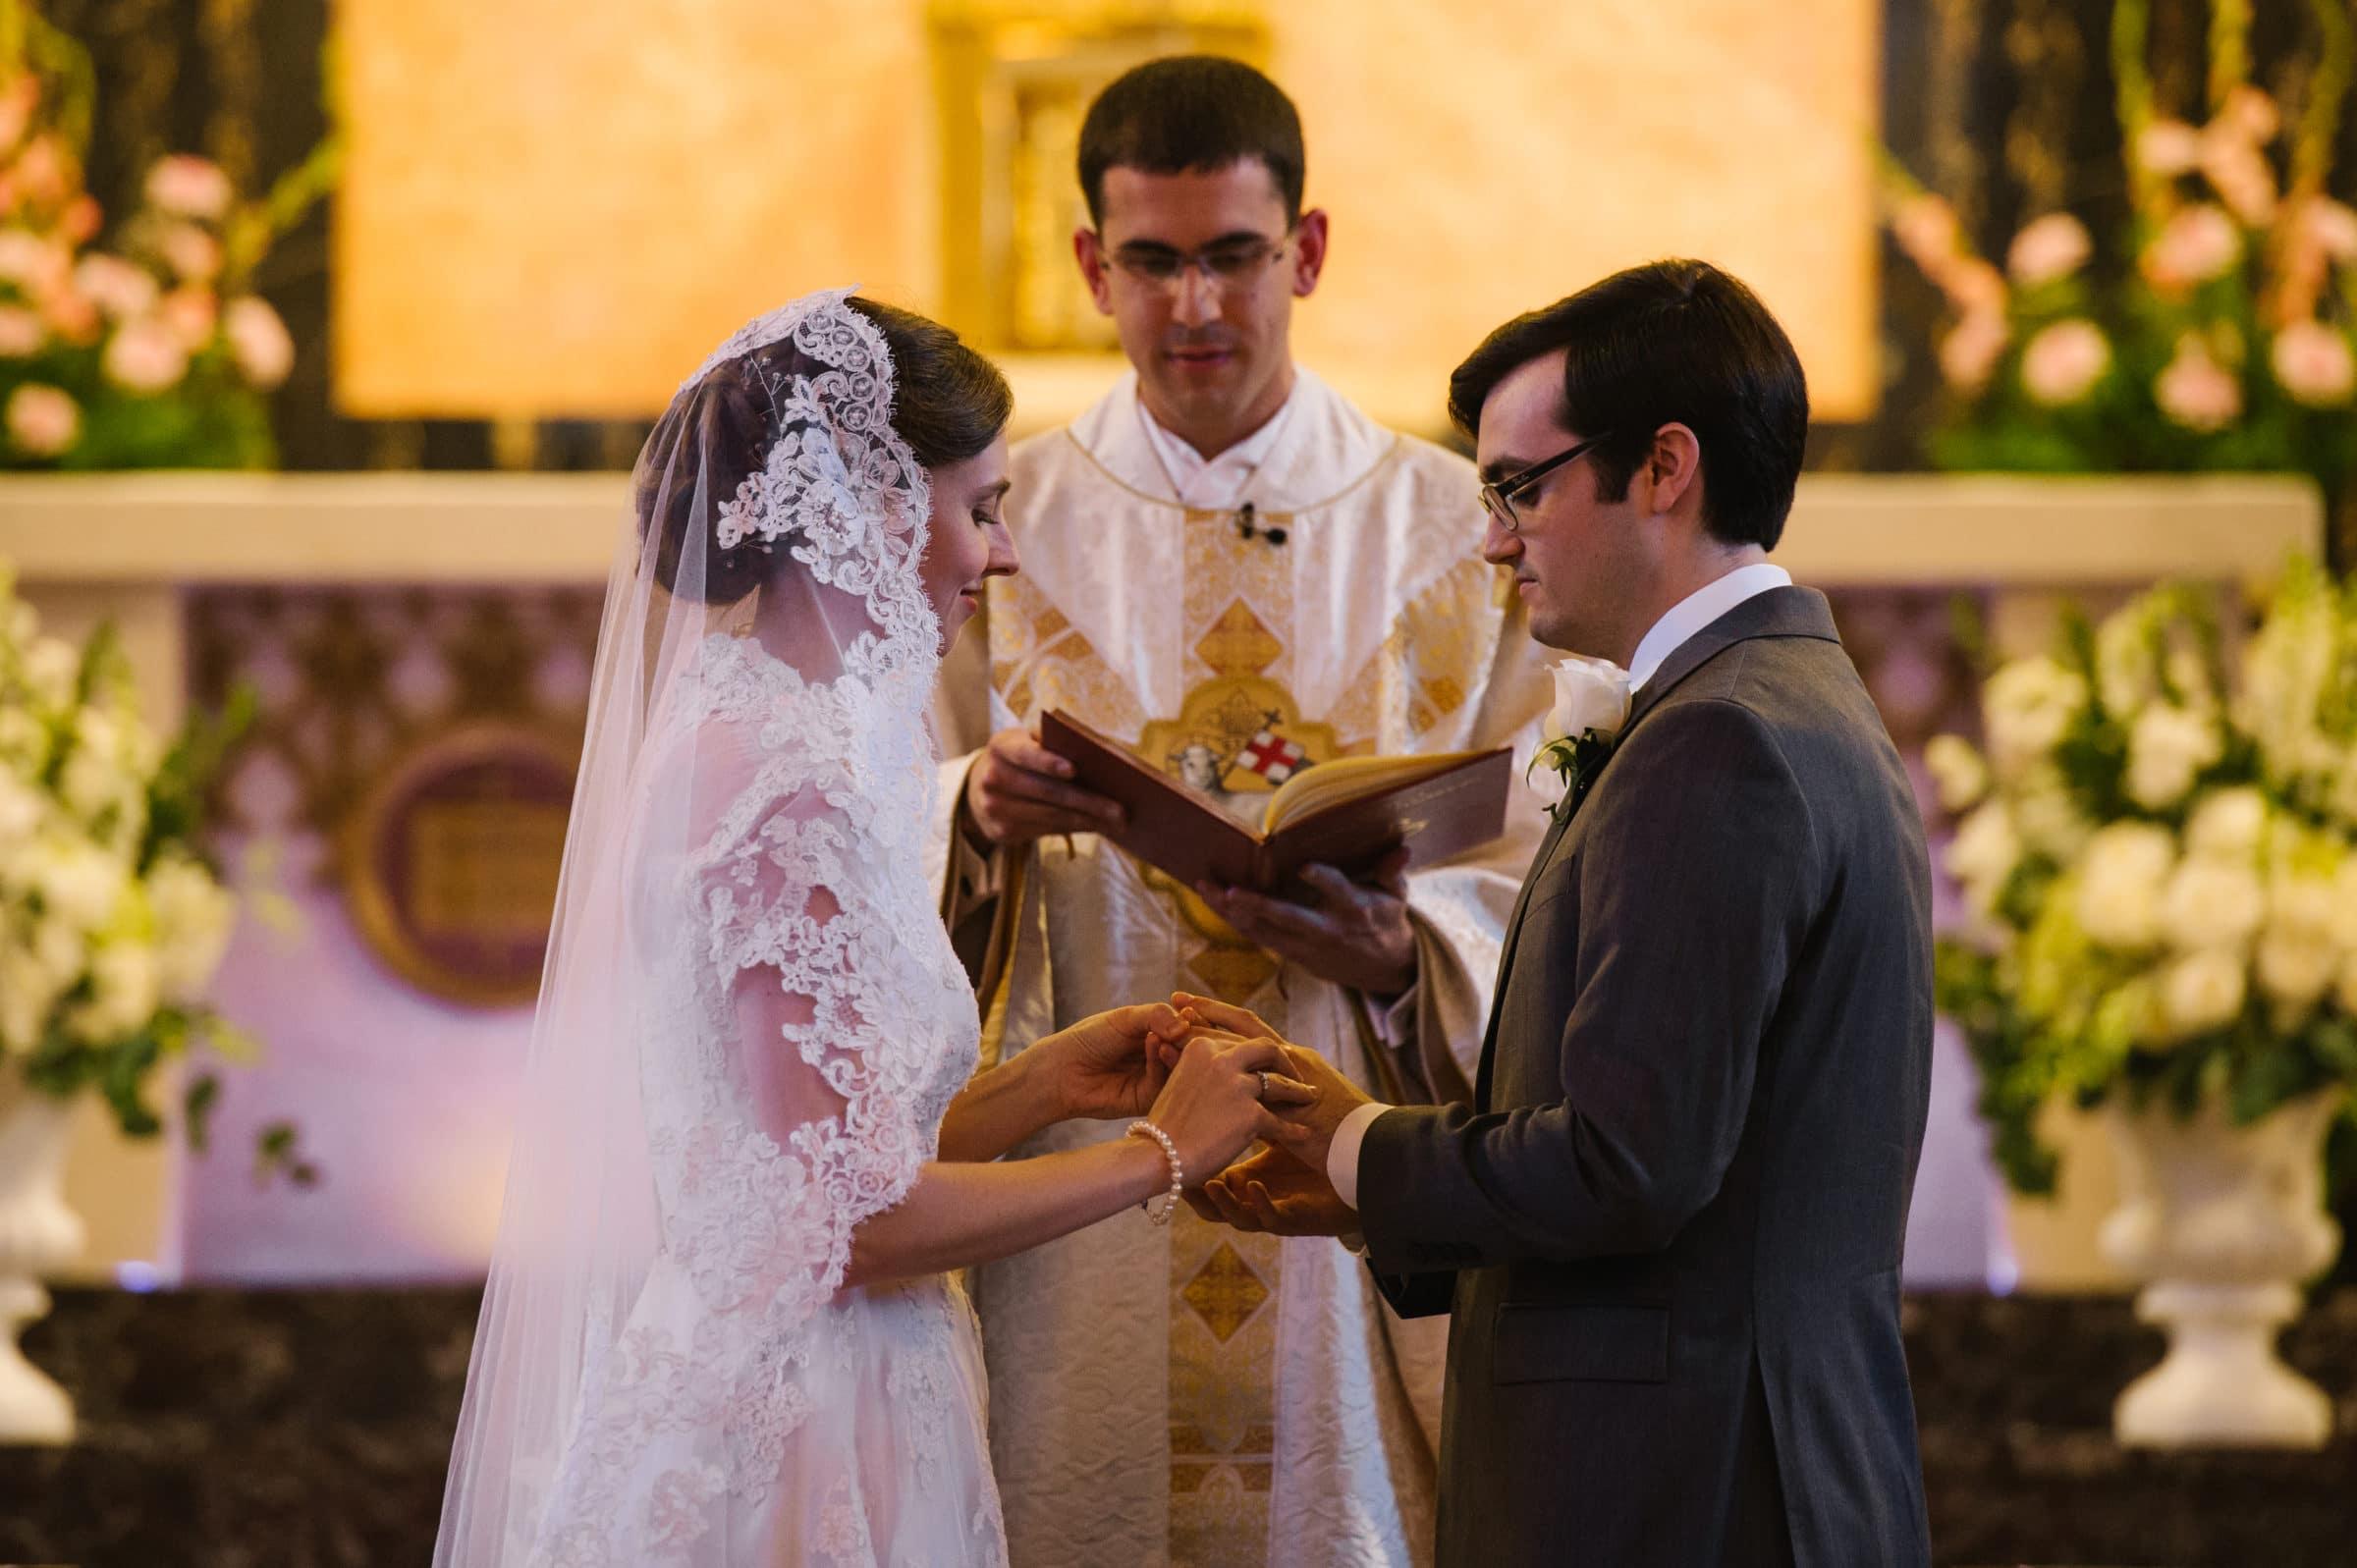 Princeton, New Jersey church wedding ceremony